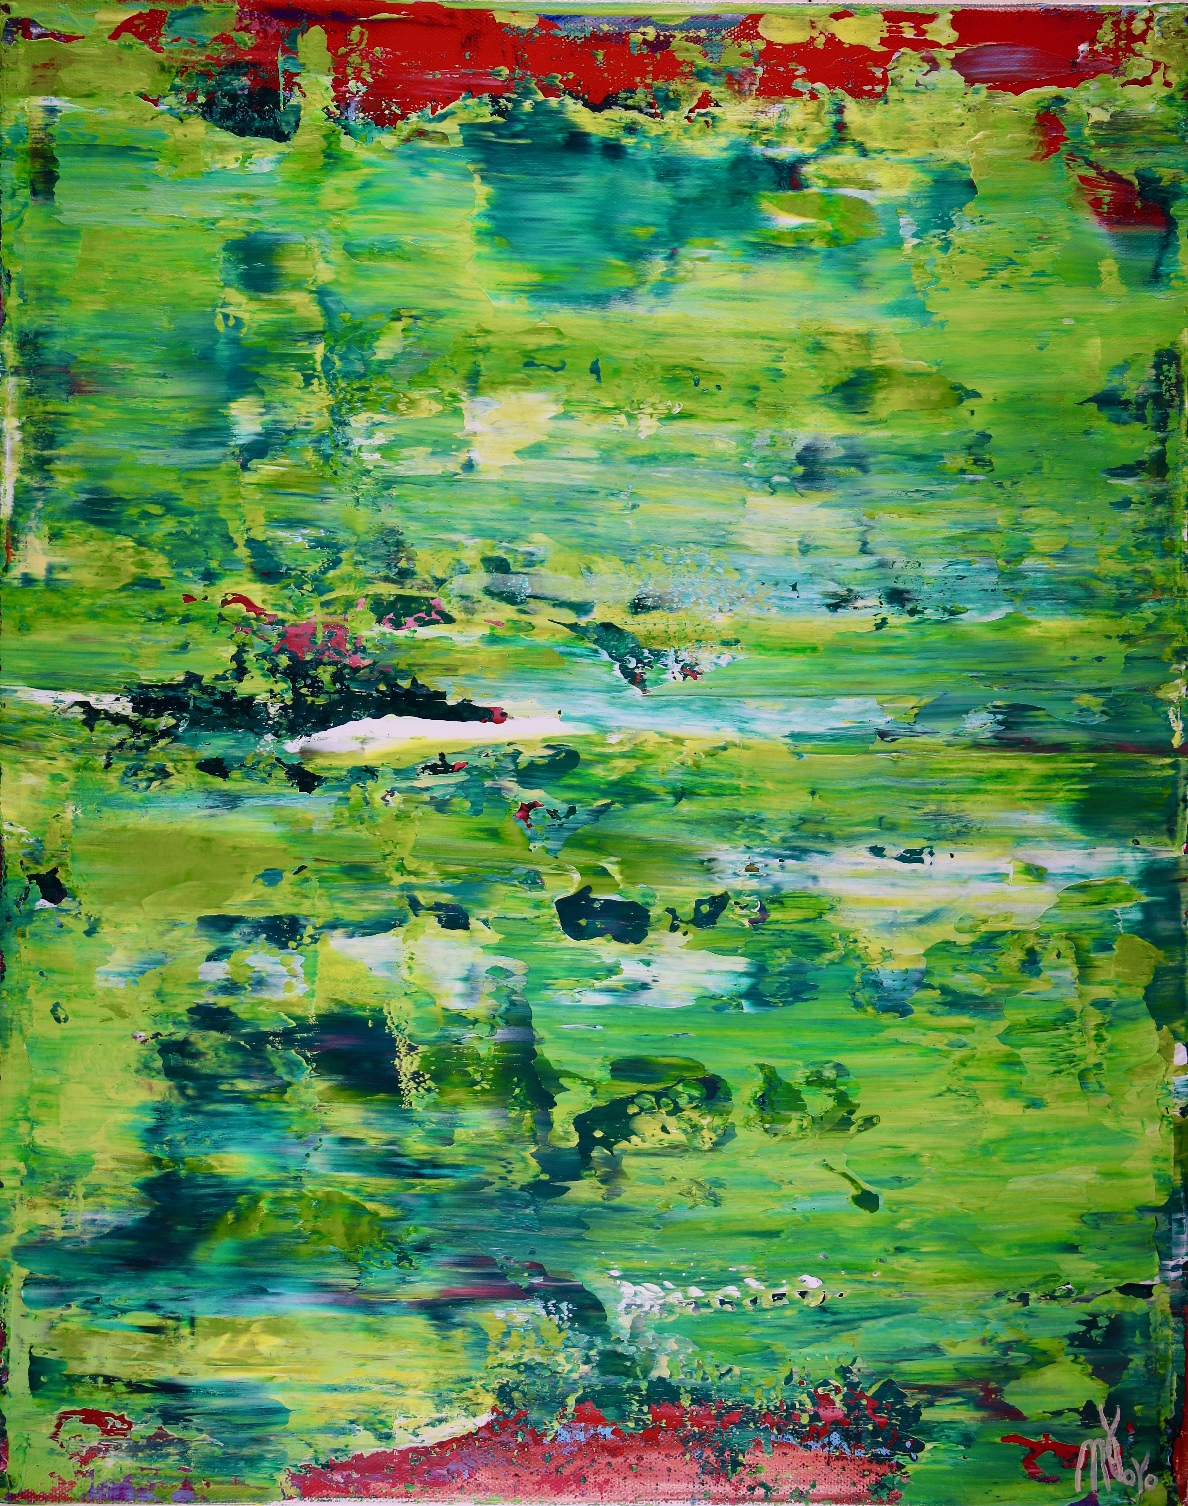 Verde Caribe by Nestor Toro - Los Angeles